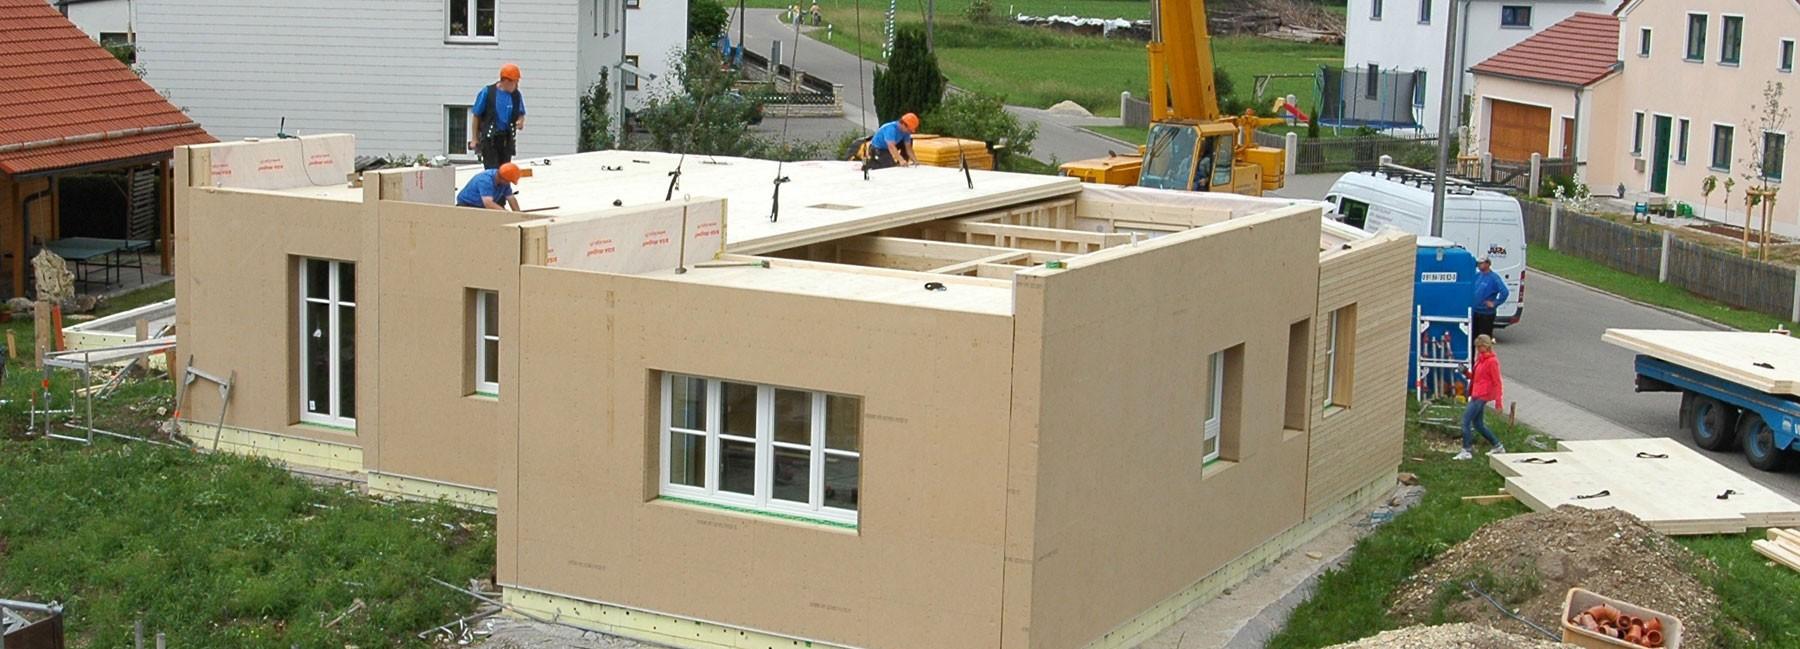 holzsystembauweise jura holzbau holzhaus bayern holzhaus regensburg holzhaus ingolstadt holzhaus. Black Bedroom Furniture Sets. Home Design Ideas